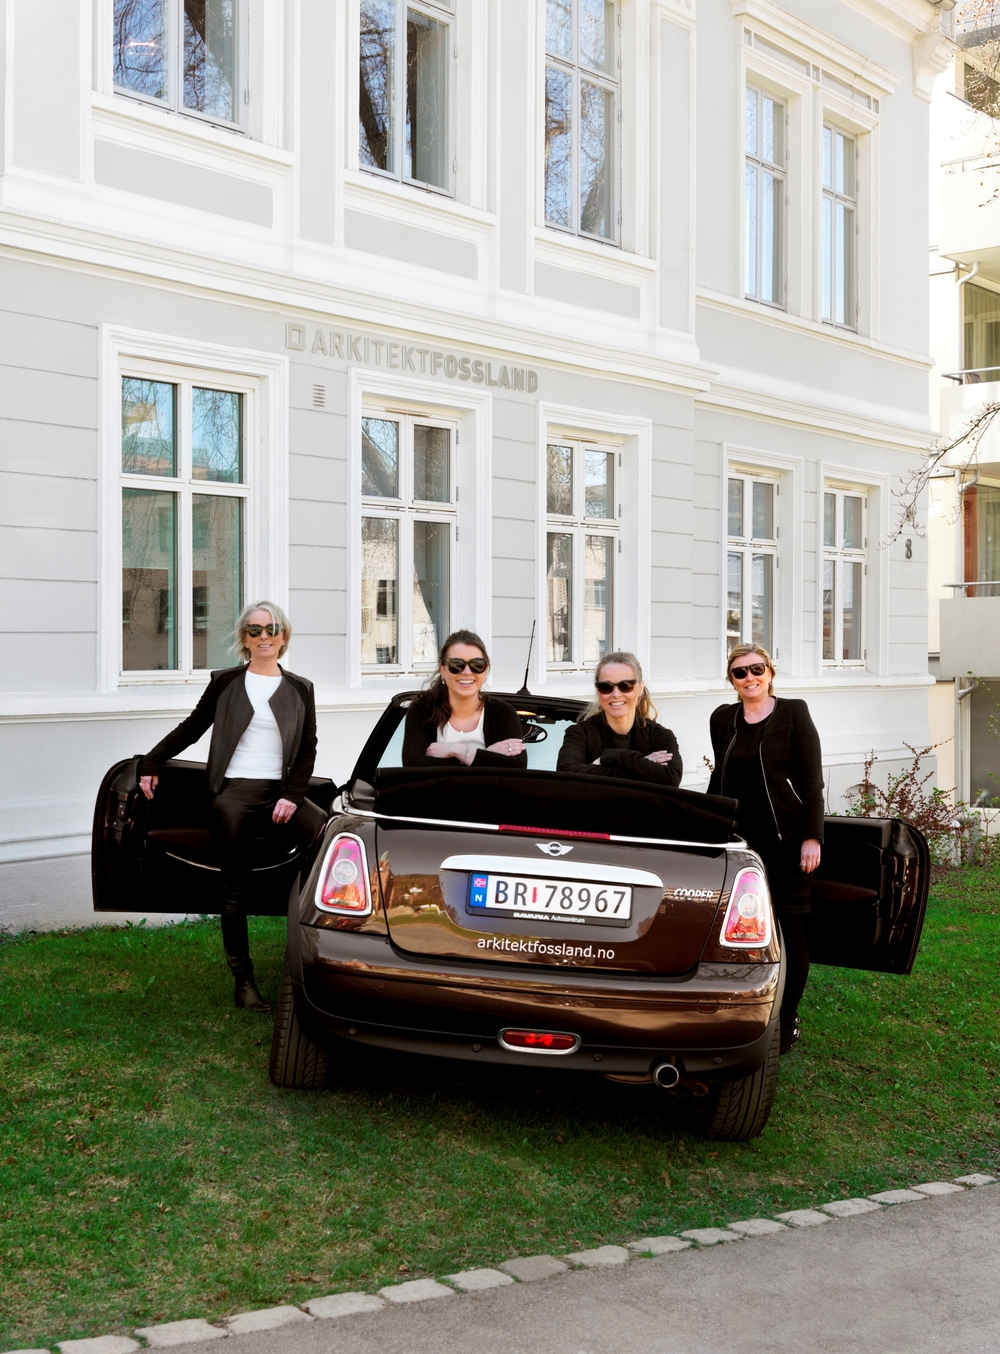 F.v: Elin Fossland, Camilla Tveit, Christine Fossland Guddal, Kristin Brække